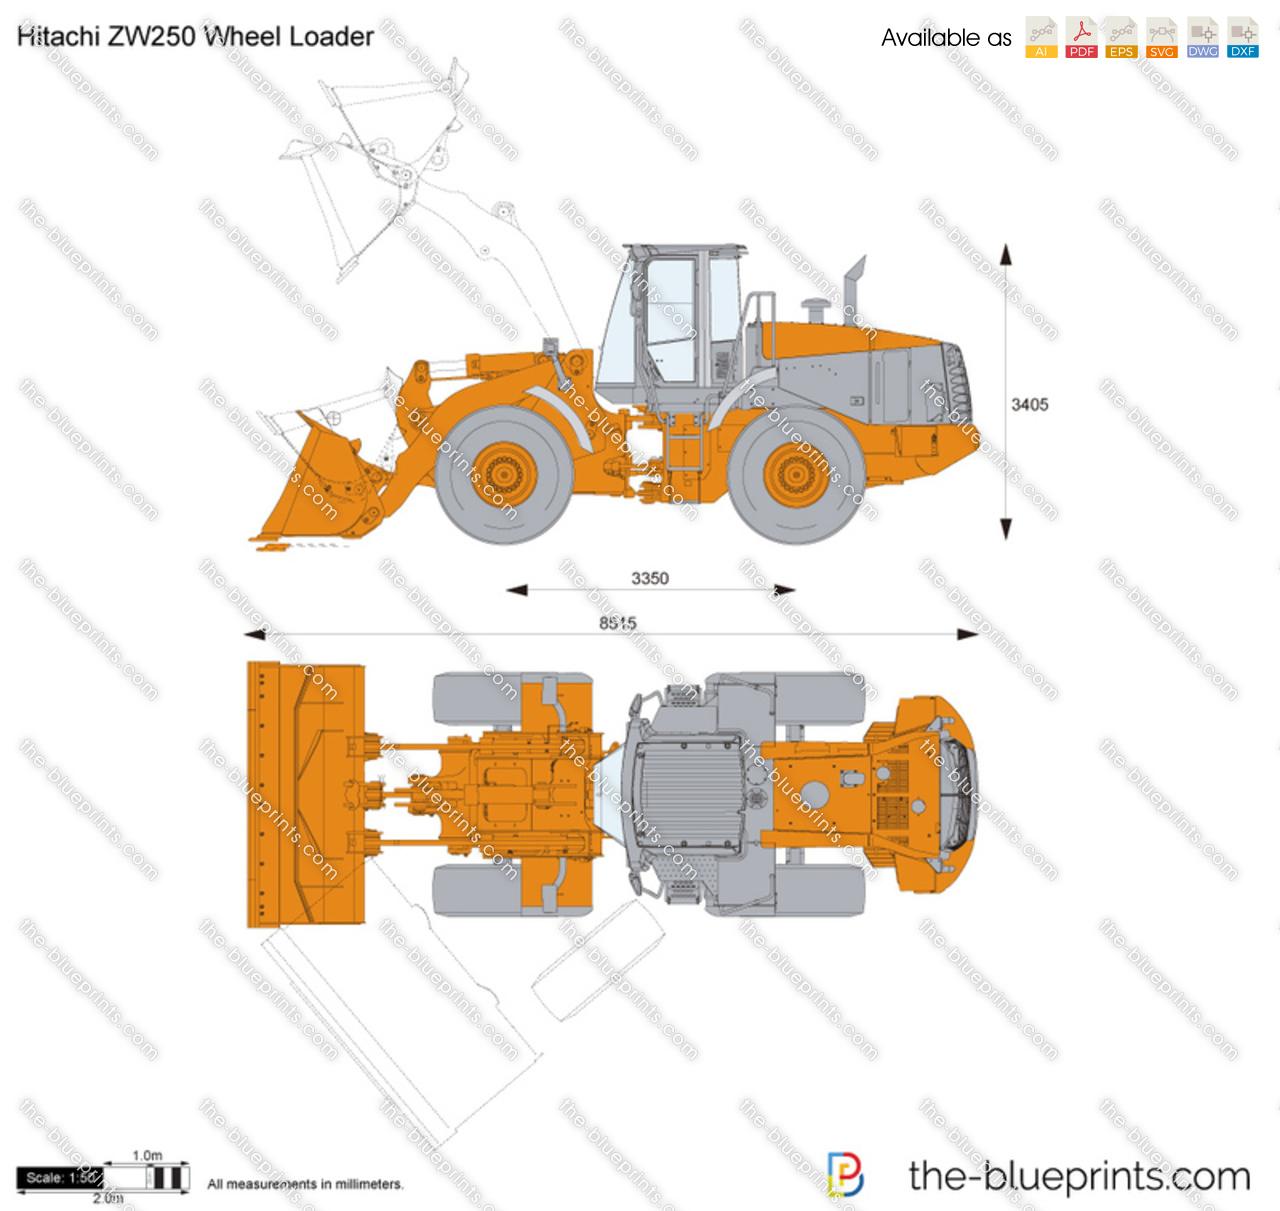 Hitachi ZW250 Wheel Loader